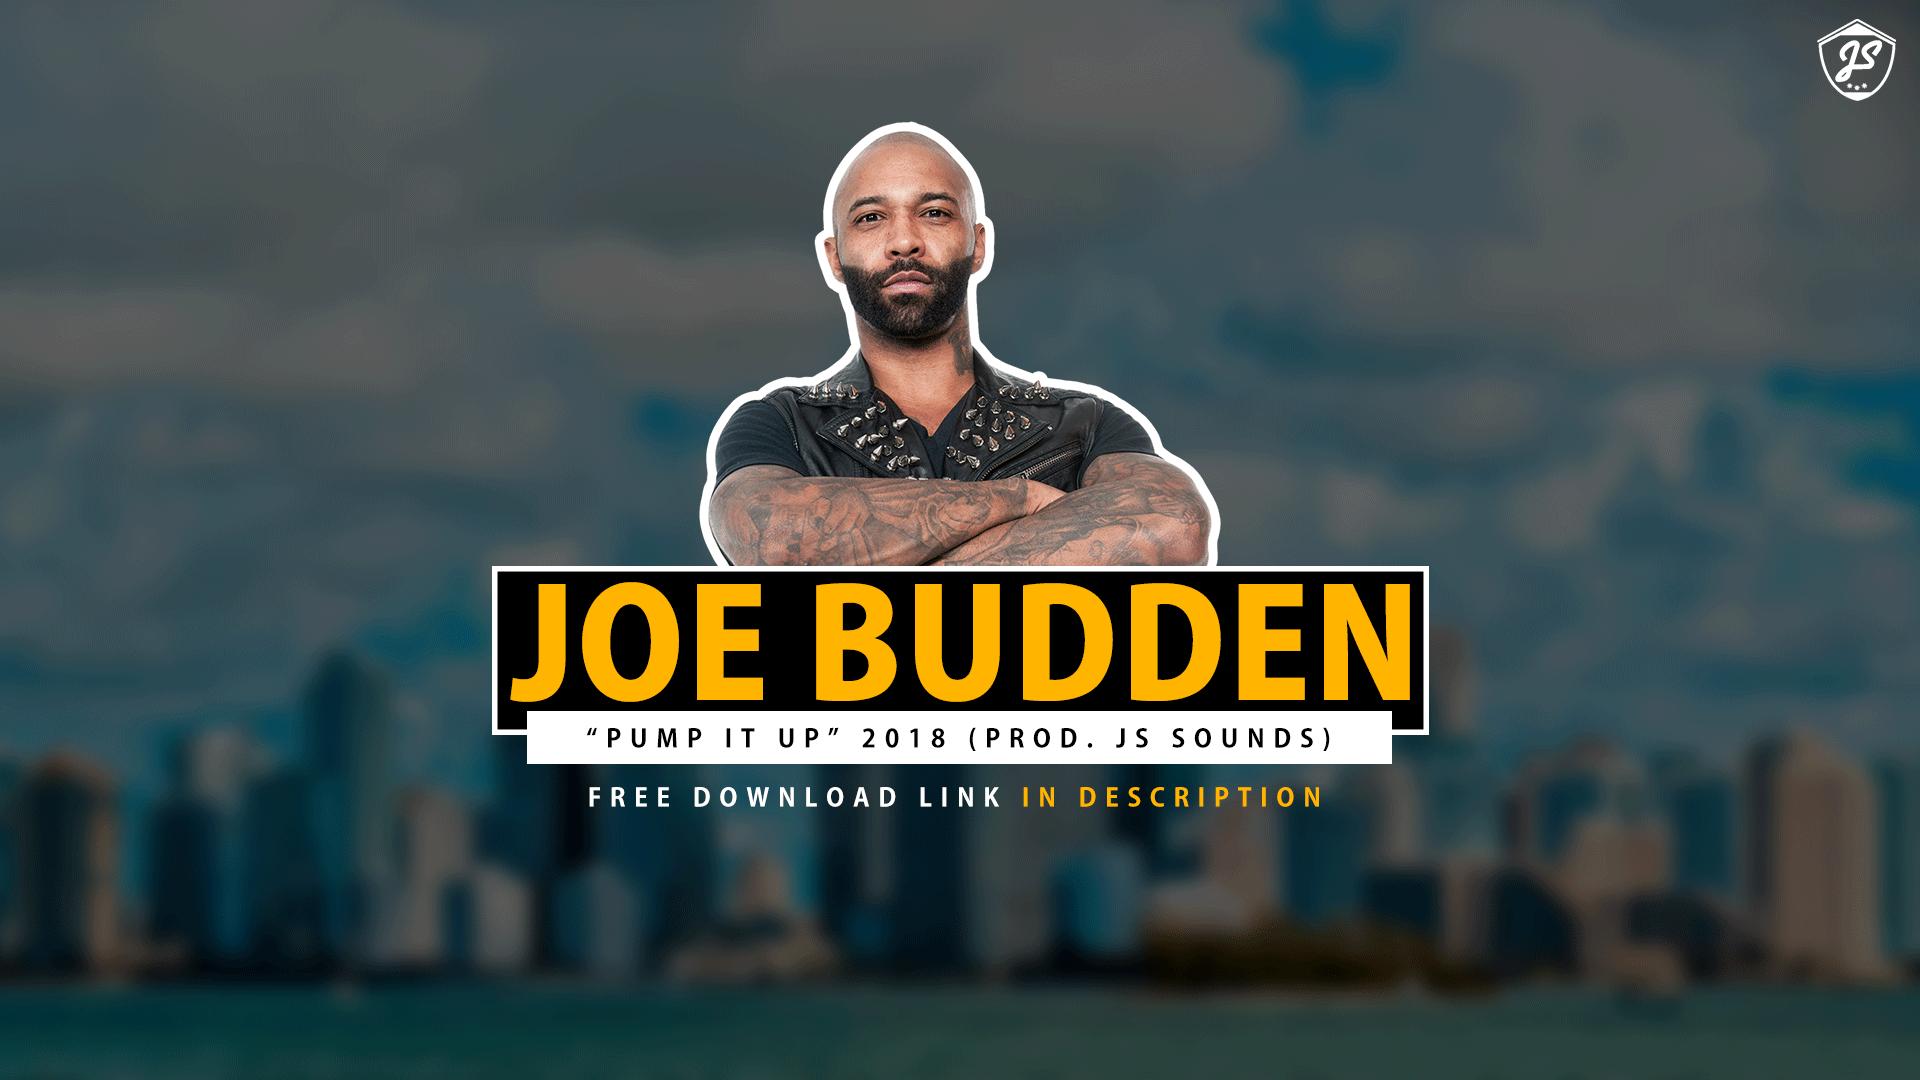 joe budden pump it up free download